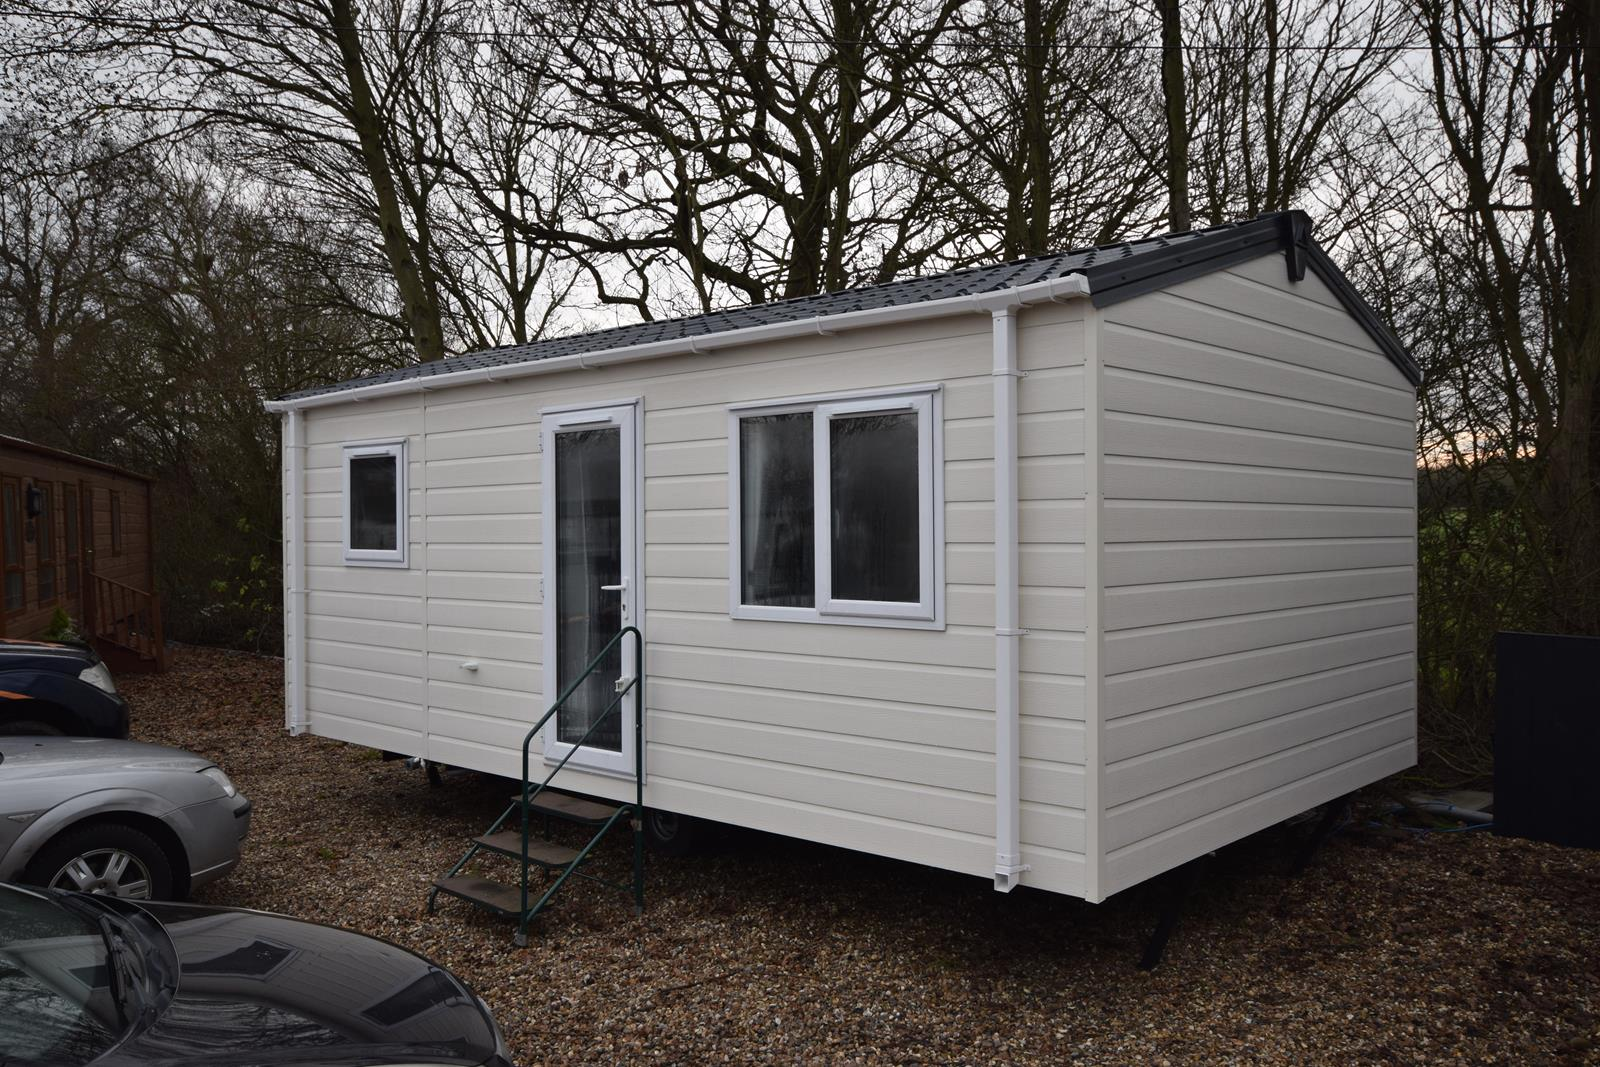 Sunrise Amenity Lodge Mobile Office Cabin